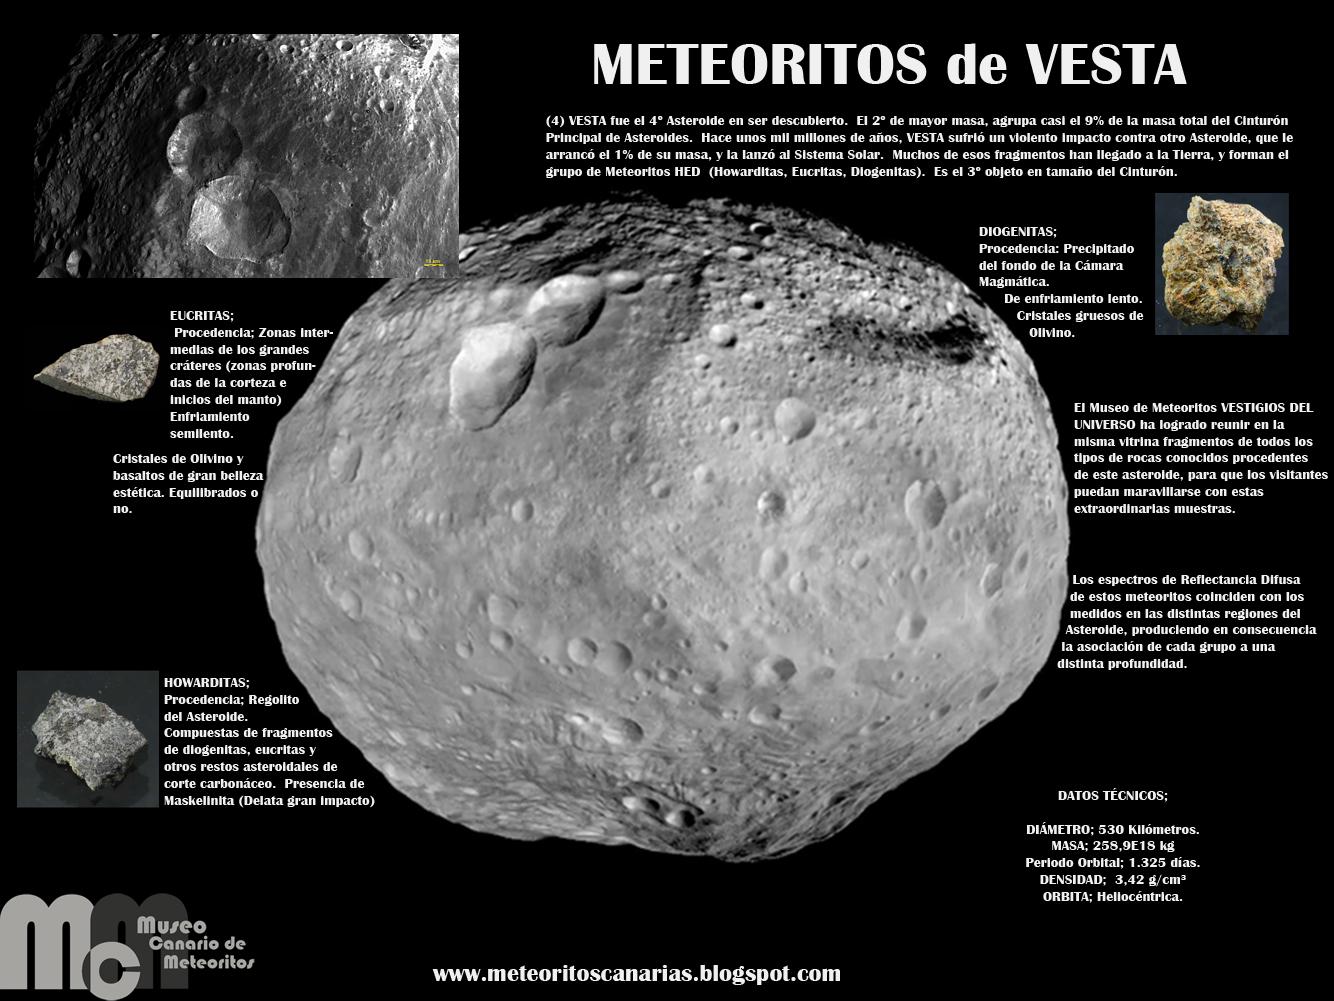 Vestan Meteorites